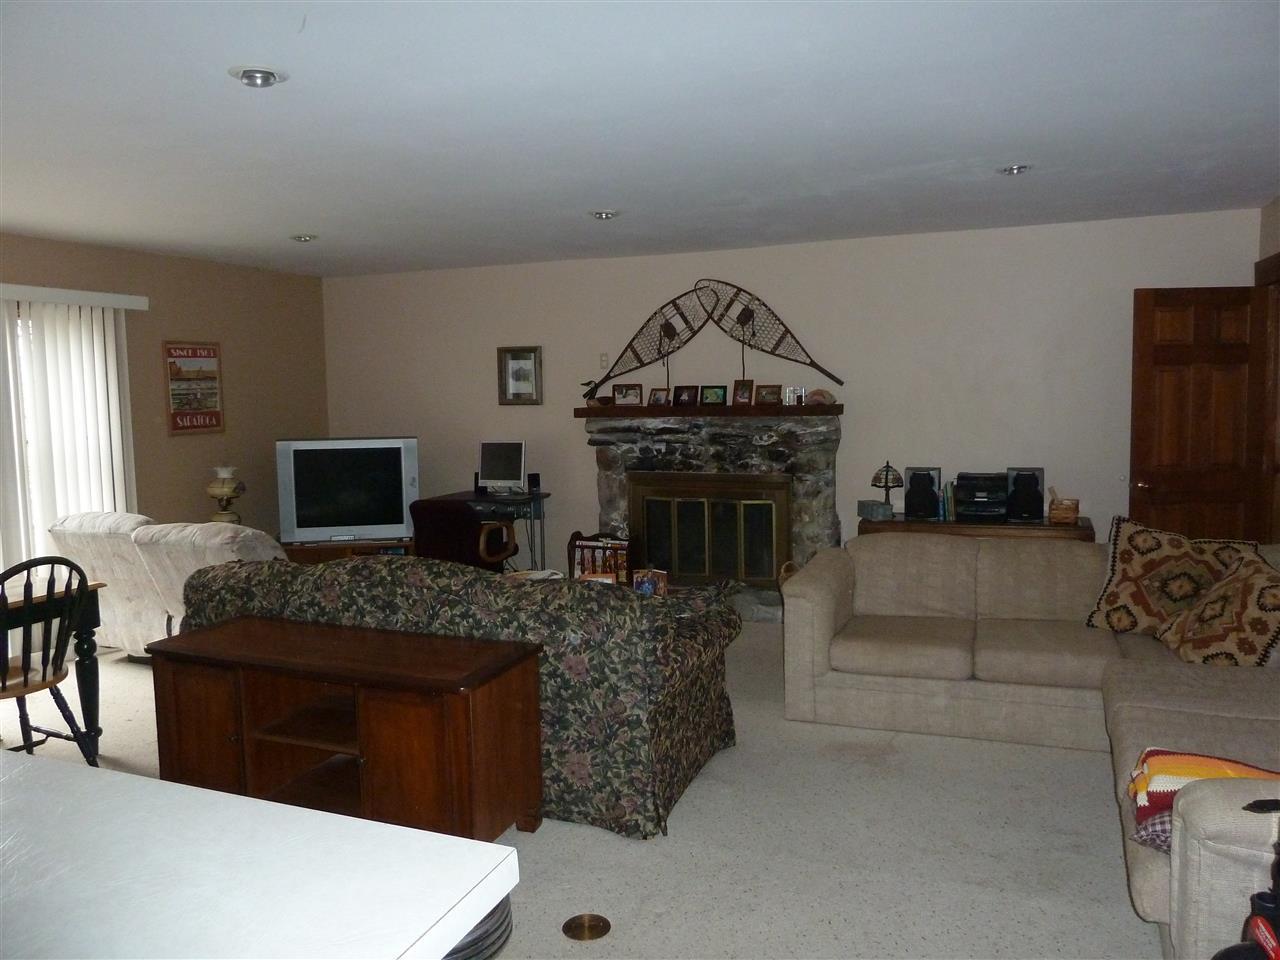 Mount-Snow-Real-Estate-4627390-1